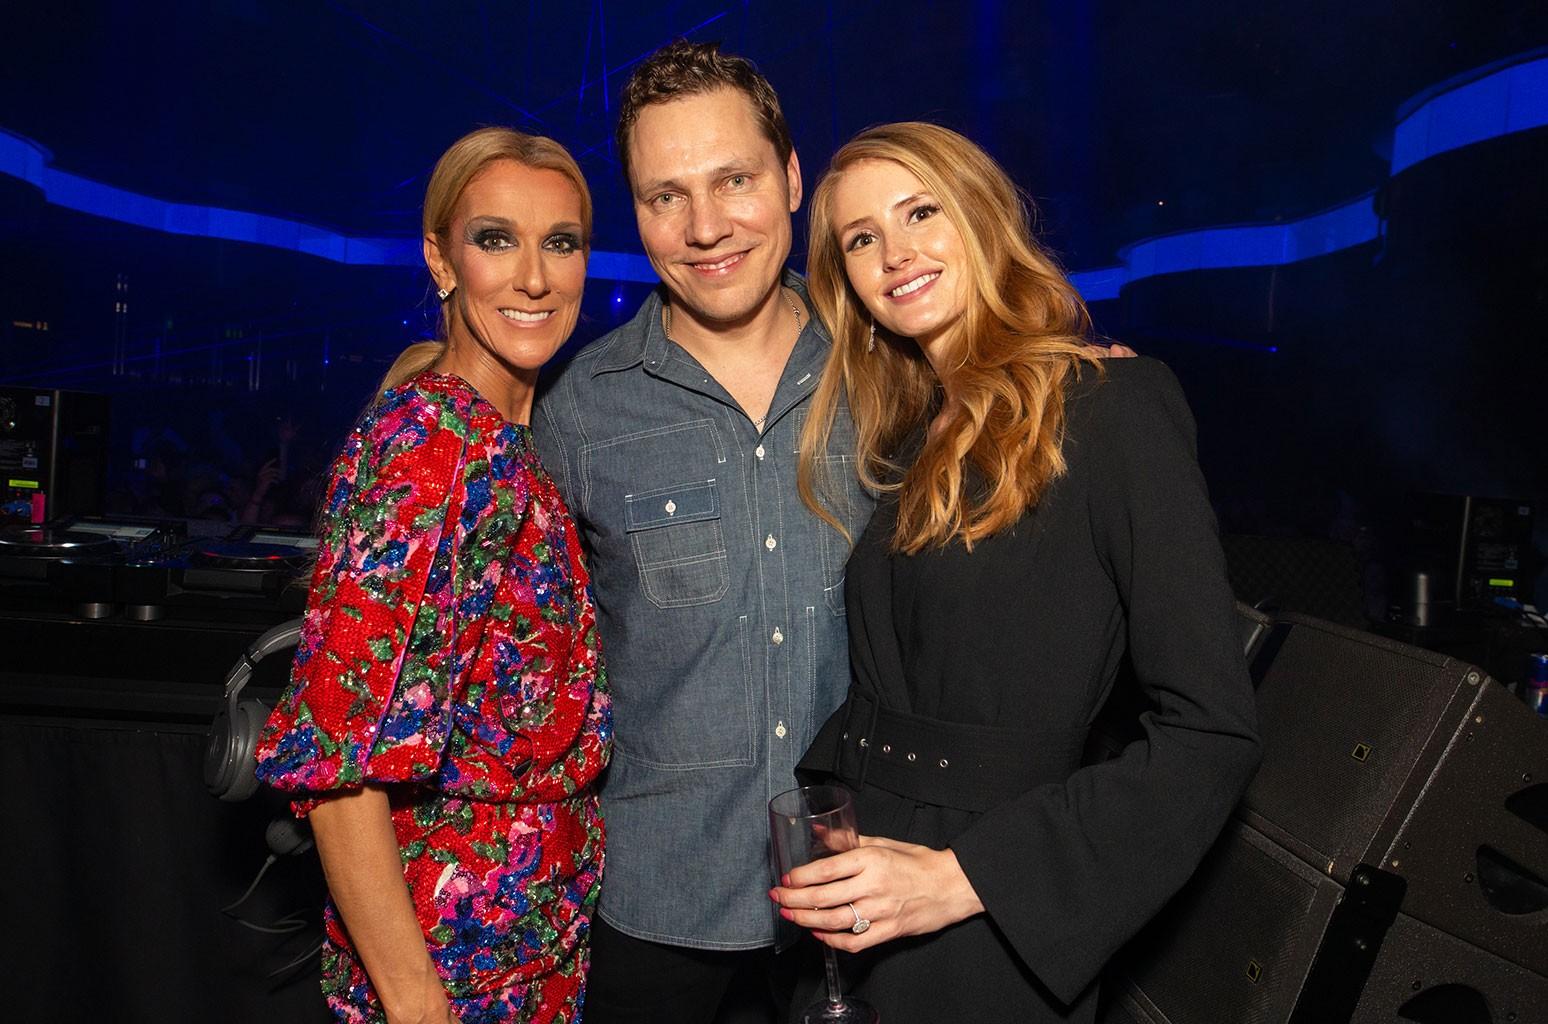 Celine Dion, Tiësto, and Annika Backes